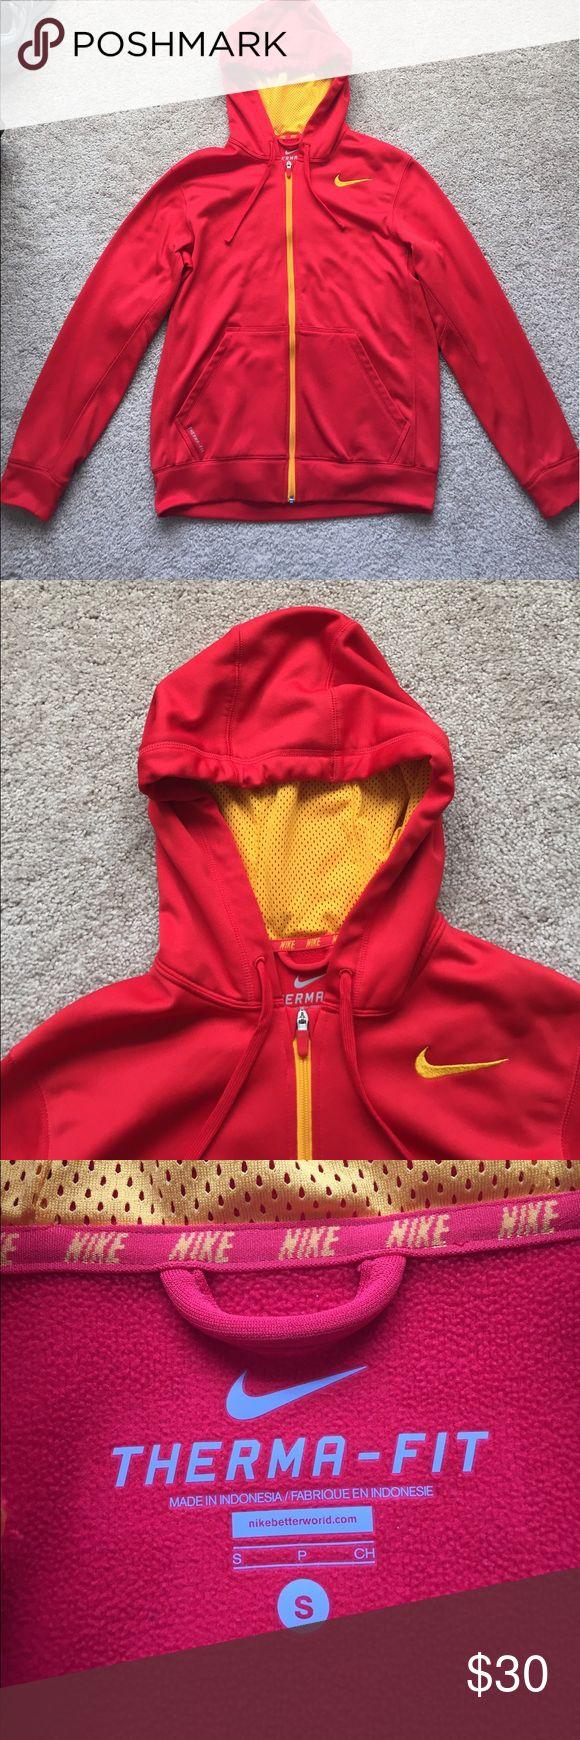 "Nike men's red zip up hoodie sz sm Excellent condition red and golden yellow zip up hoodie ! Length is 26"" Nike Shirts Sweatshirts & Hoodies"